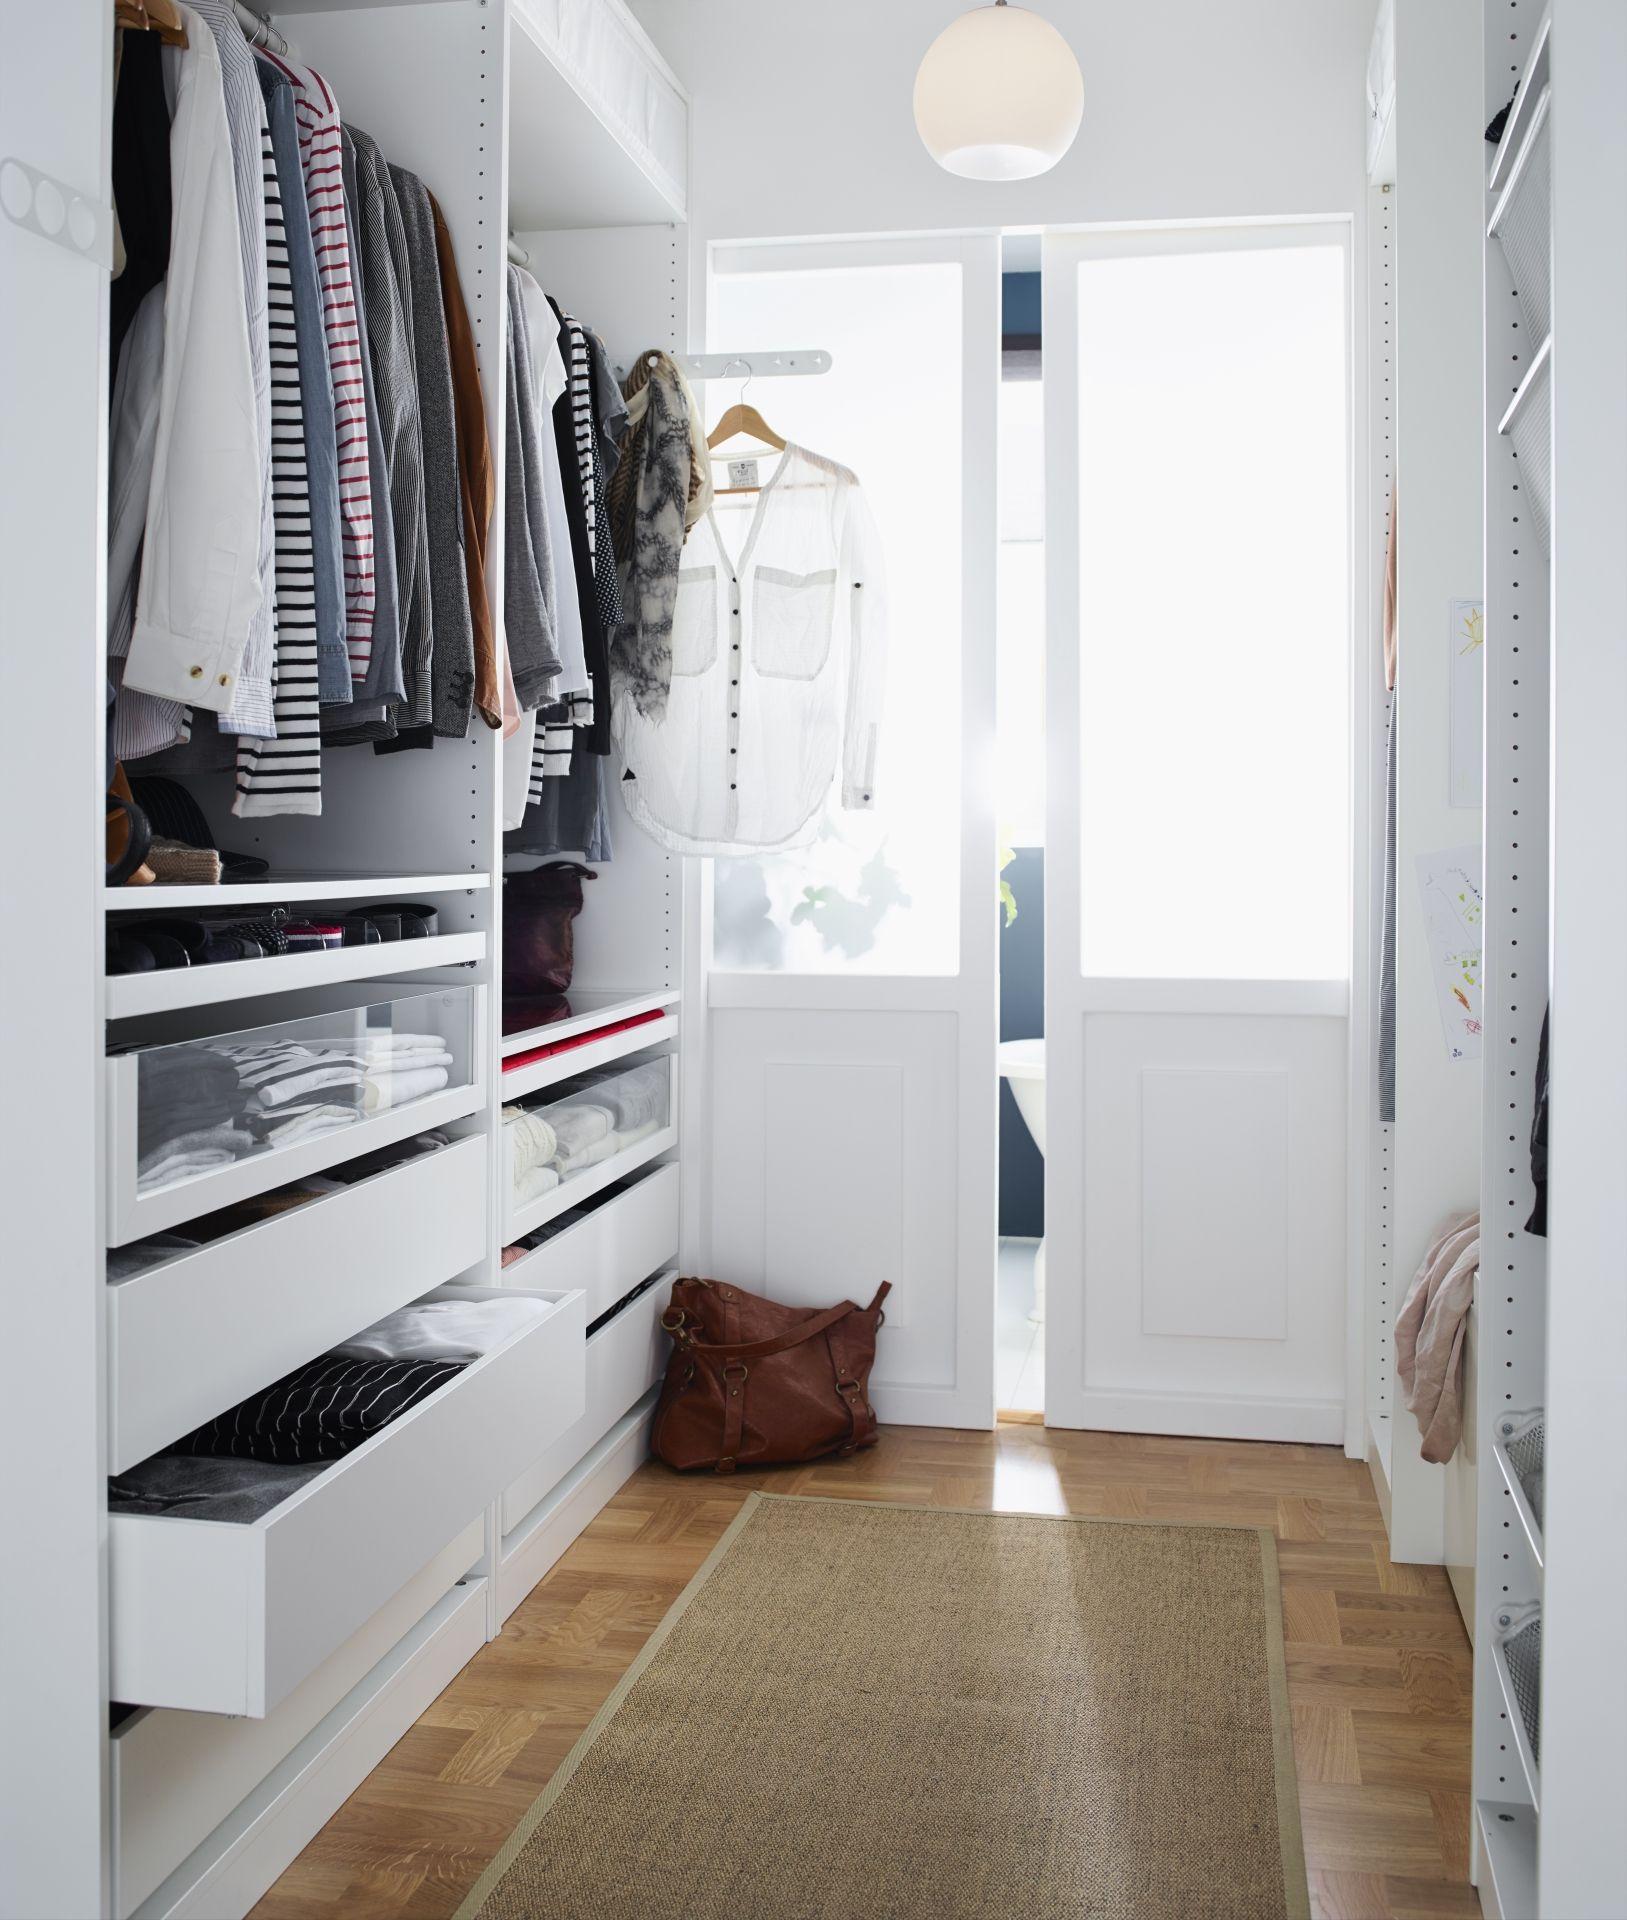 PAX garderobekast  IKEA IKEAnl modulair systeem kast